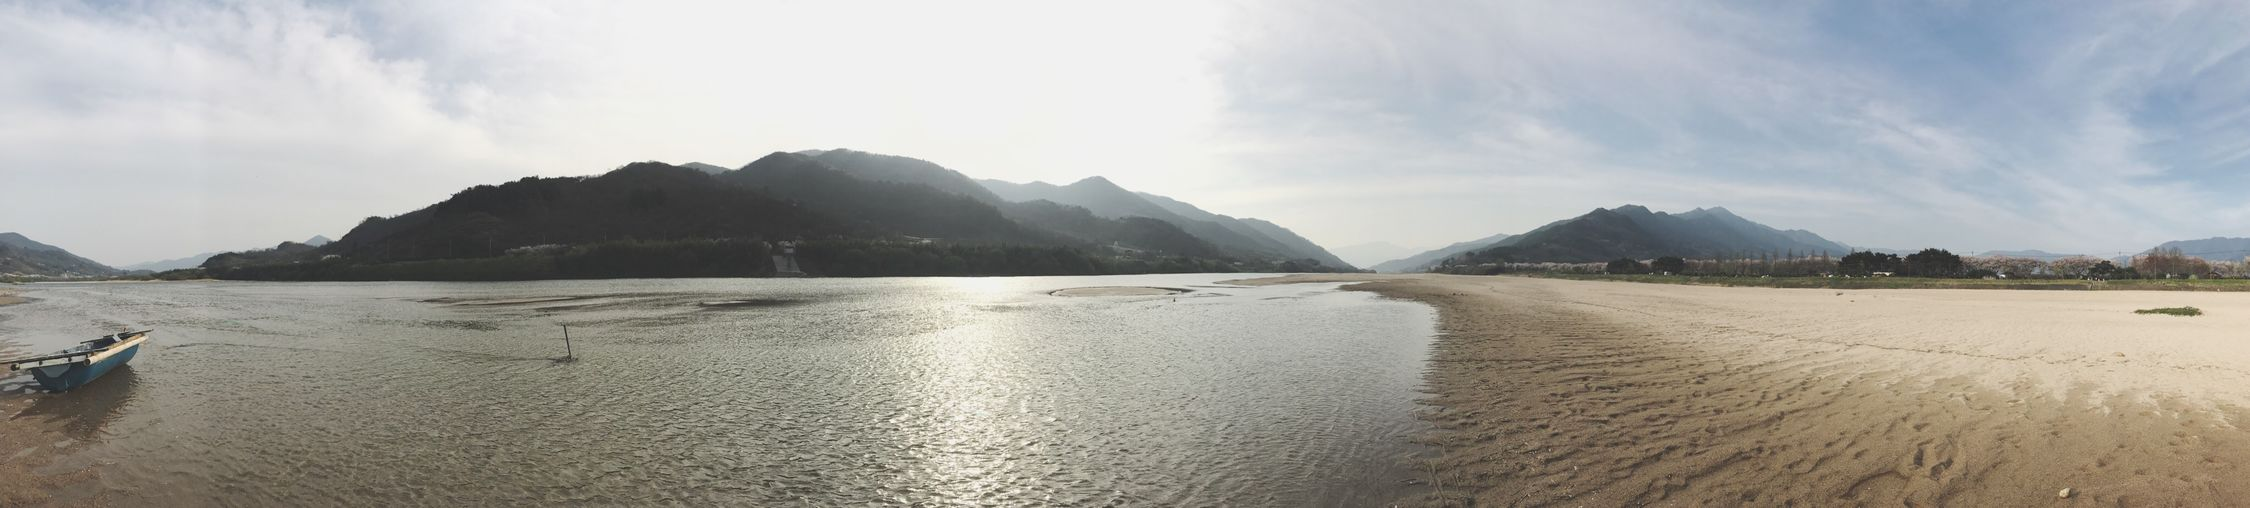 Sumjin_river Koreannature